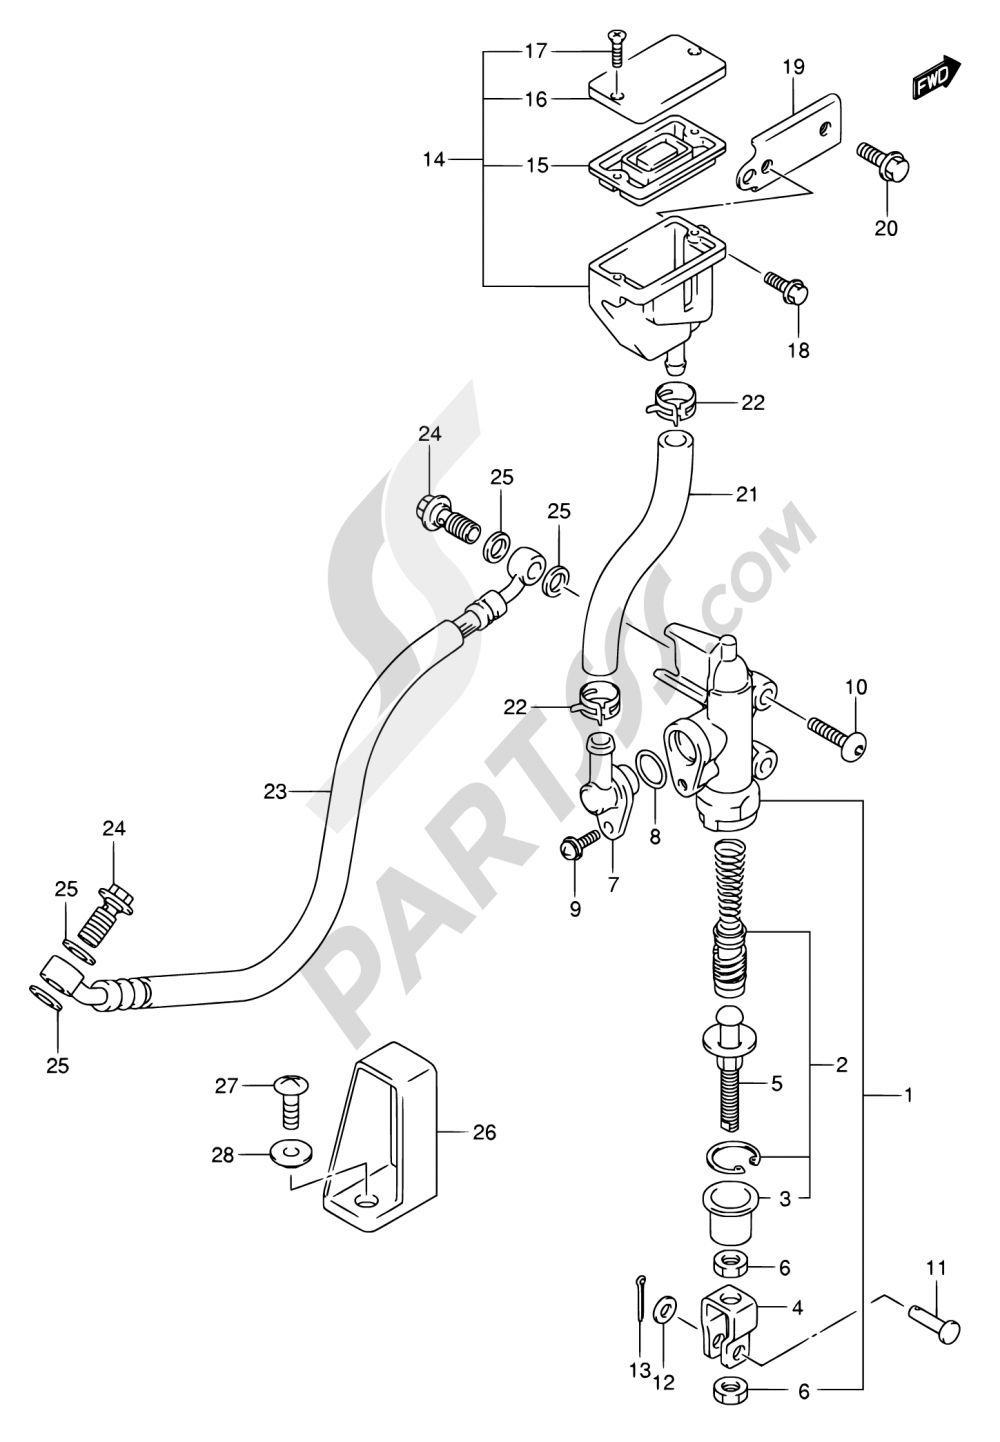 61B - REAR MASTER CYLINDER (SV1000K5/U1K5/U2K5/SK5/S1K5/S2K5) Suzuki SV1000 2004